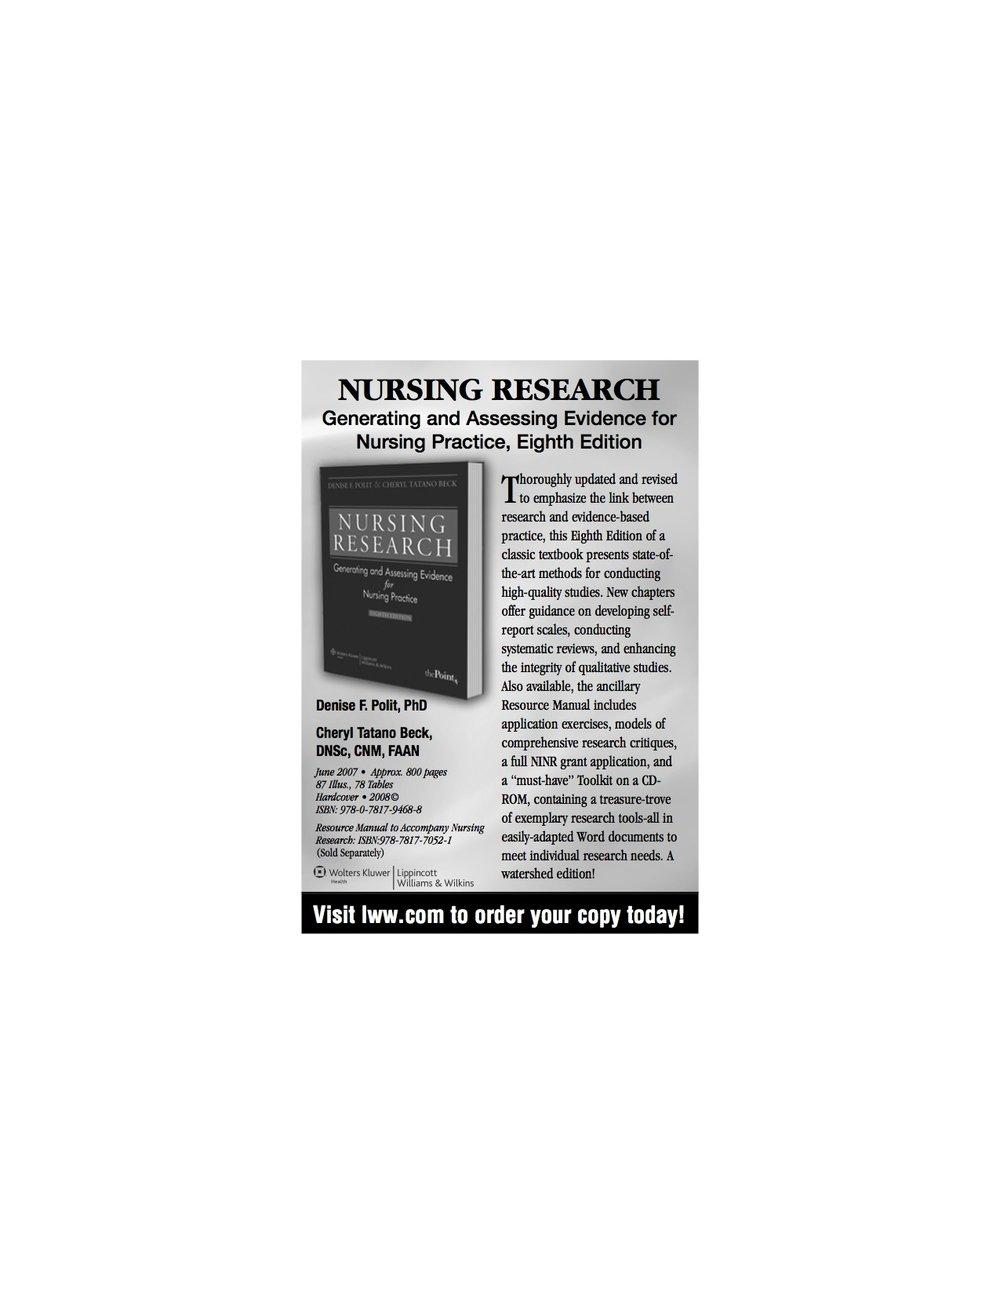 Nursing-Research-Space-Ad.jpg